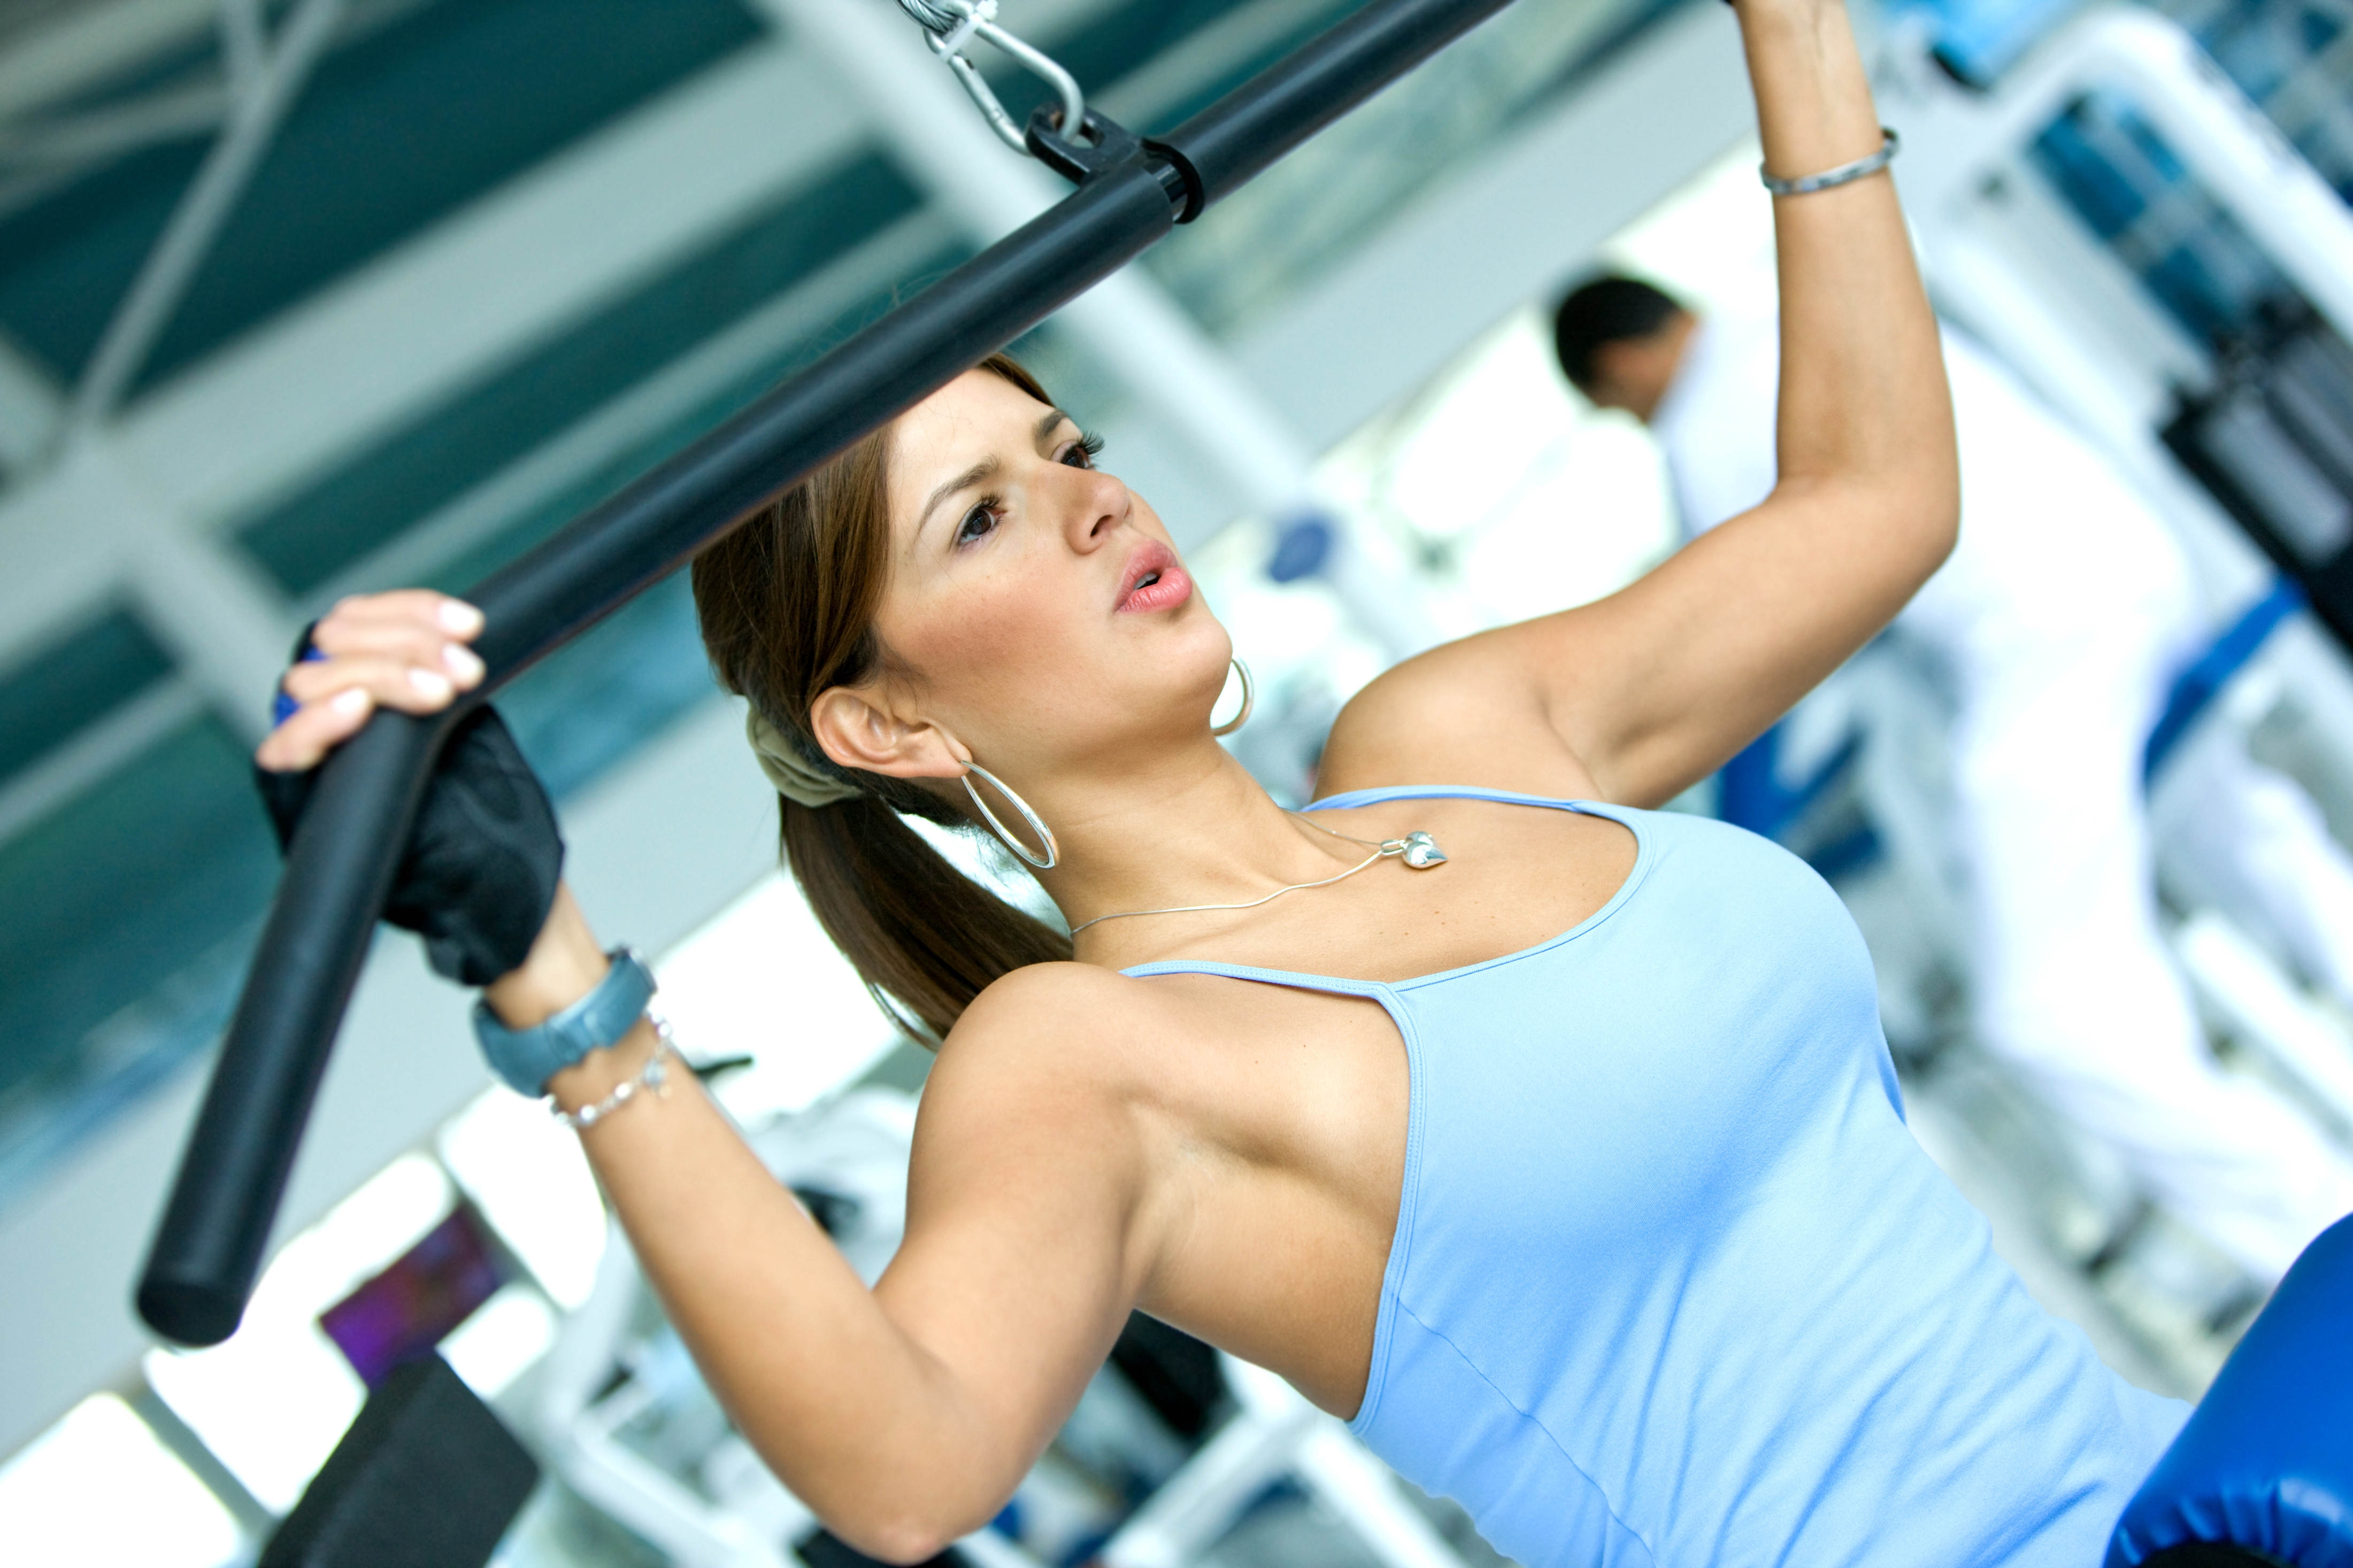 Fitness women wallpaper wallpapersafari - Fitness wallpapers for desktop ...